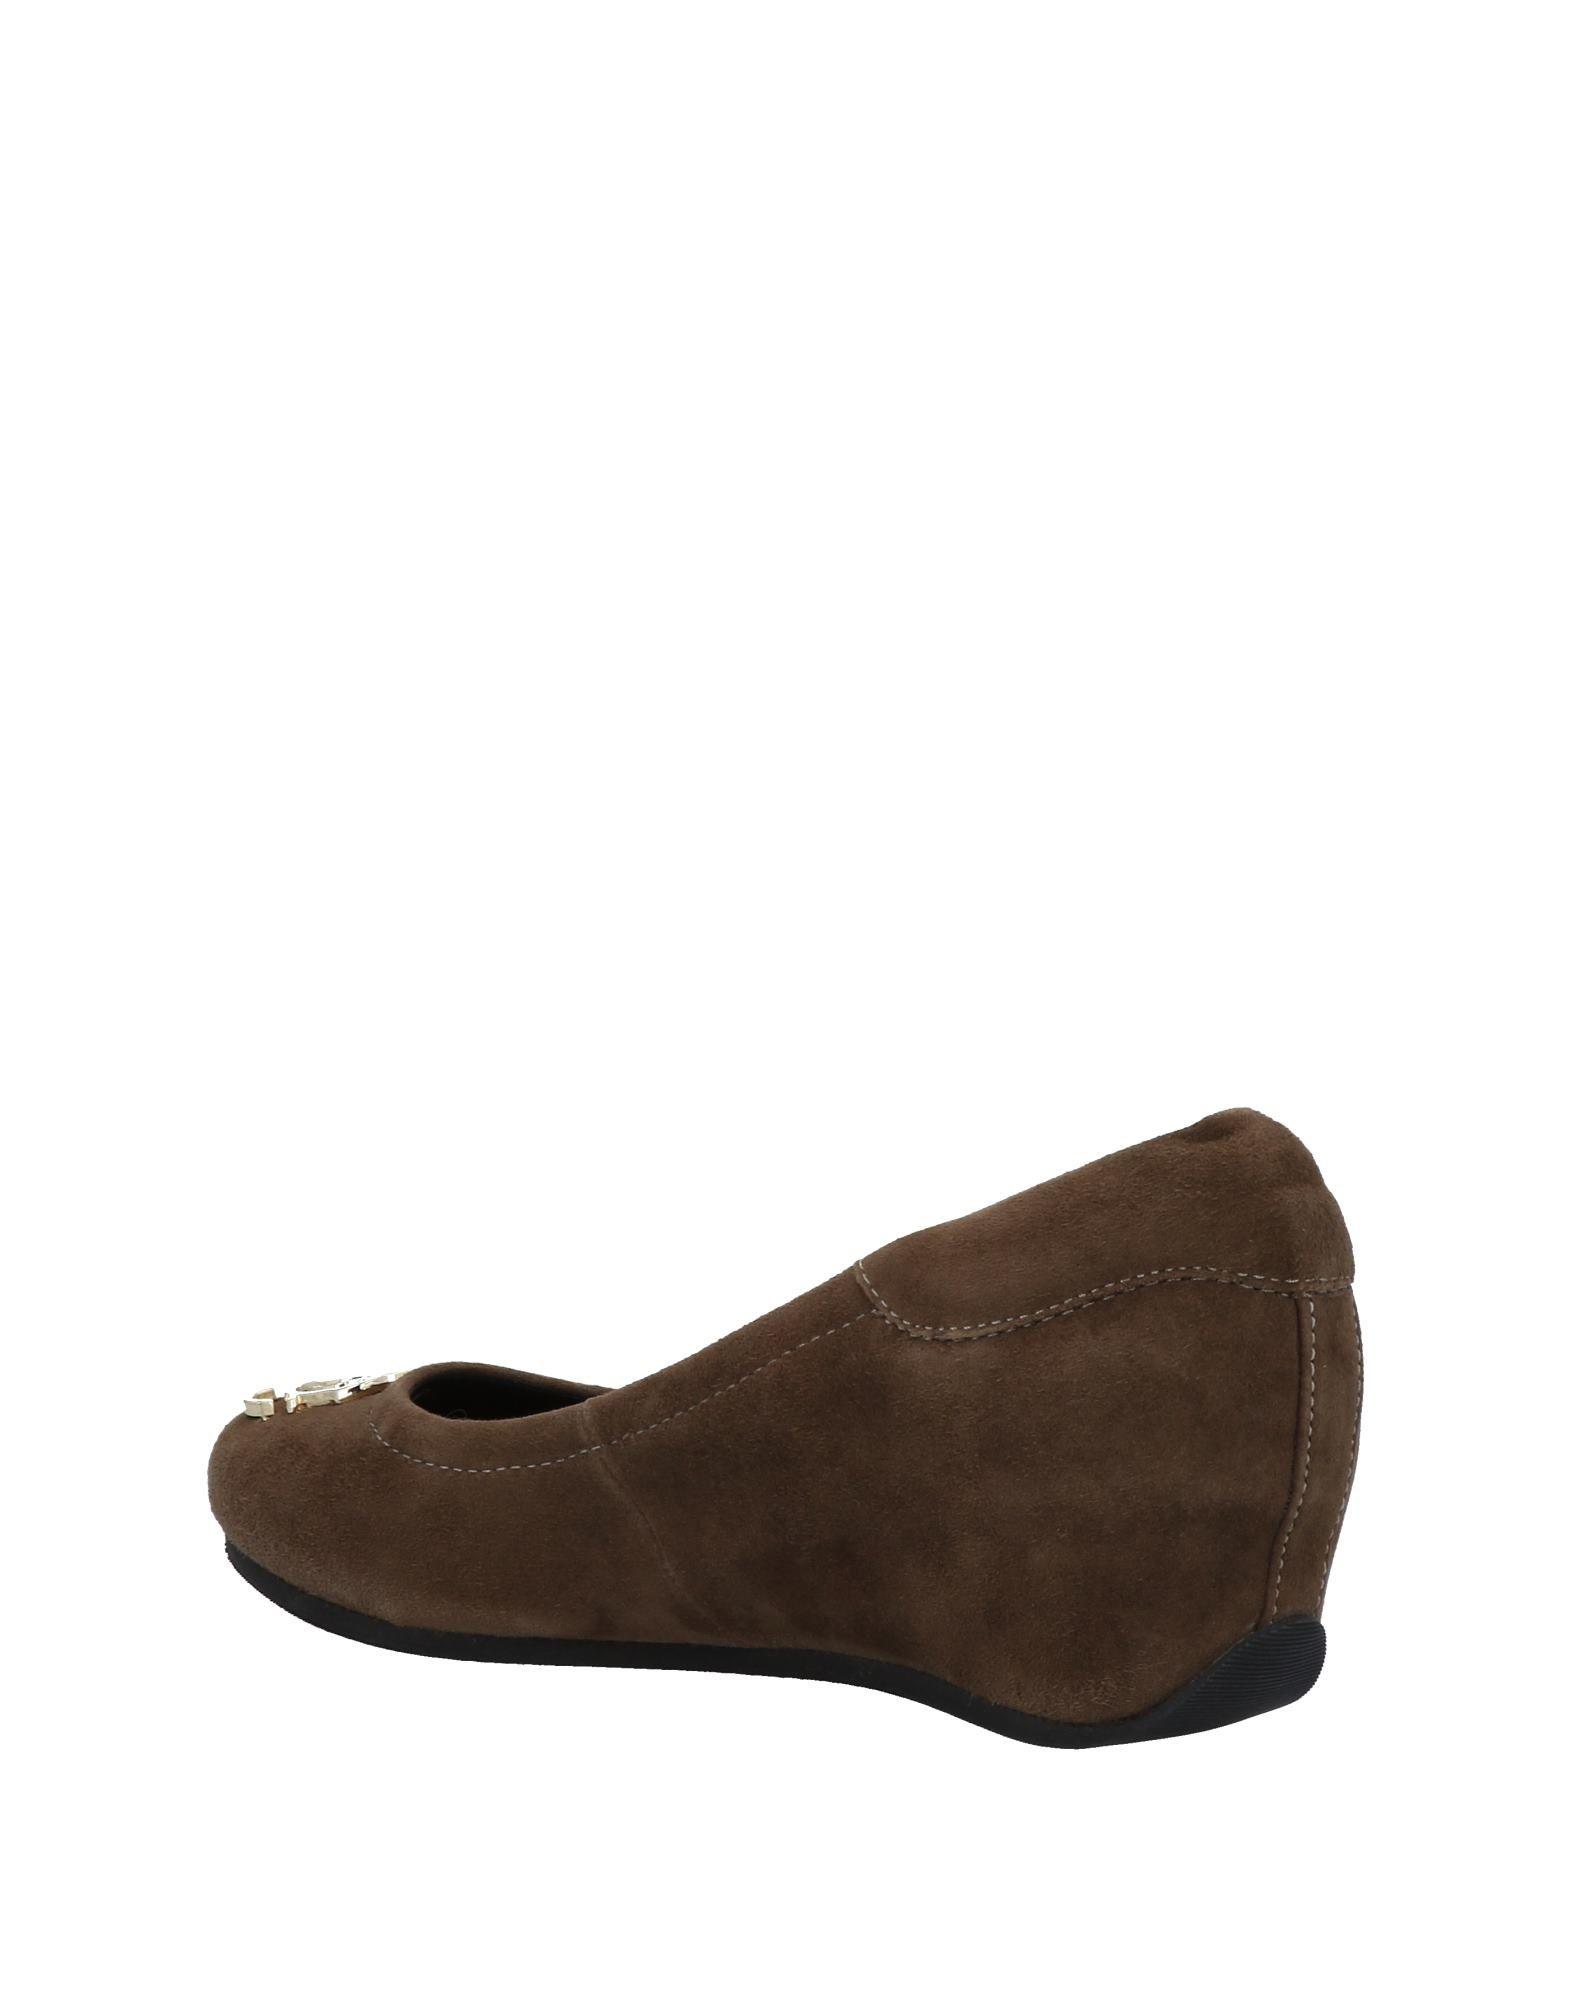 Braccialini Pumps Damen beliebte  11484989FQ Gute Qualität beliebte Damen Schuhe 4f3956